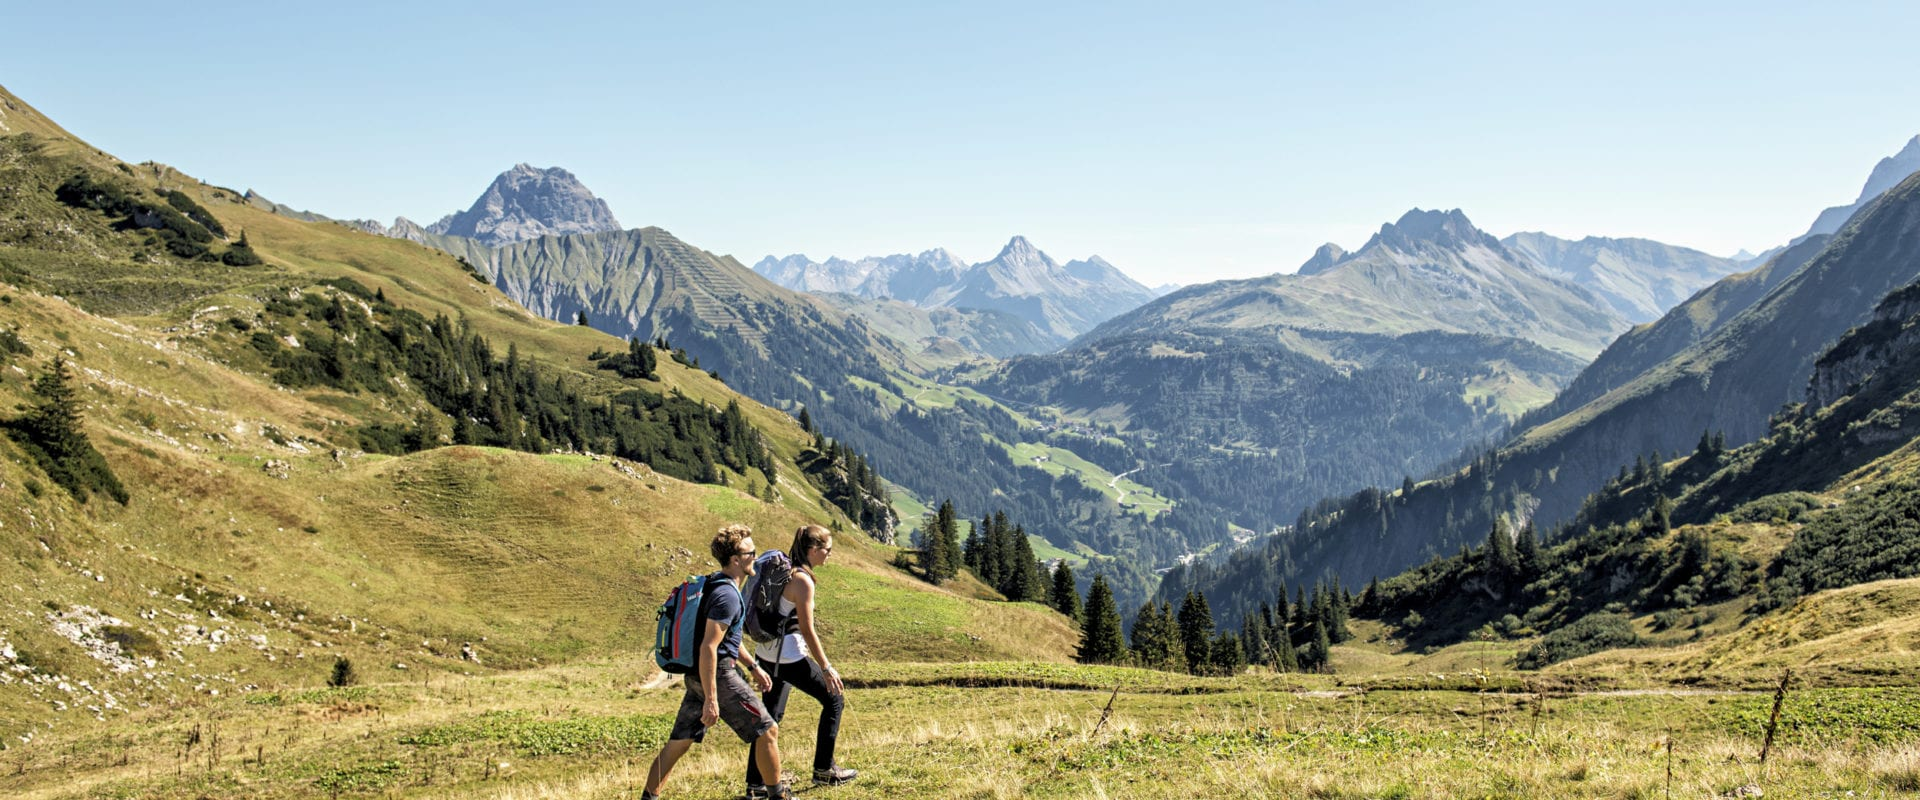 Alpine Hut Hikes